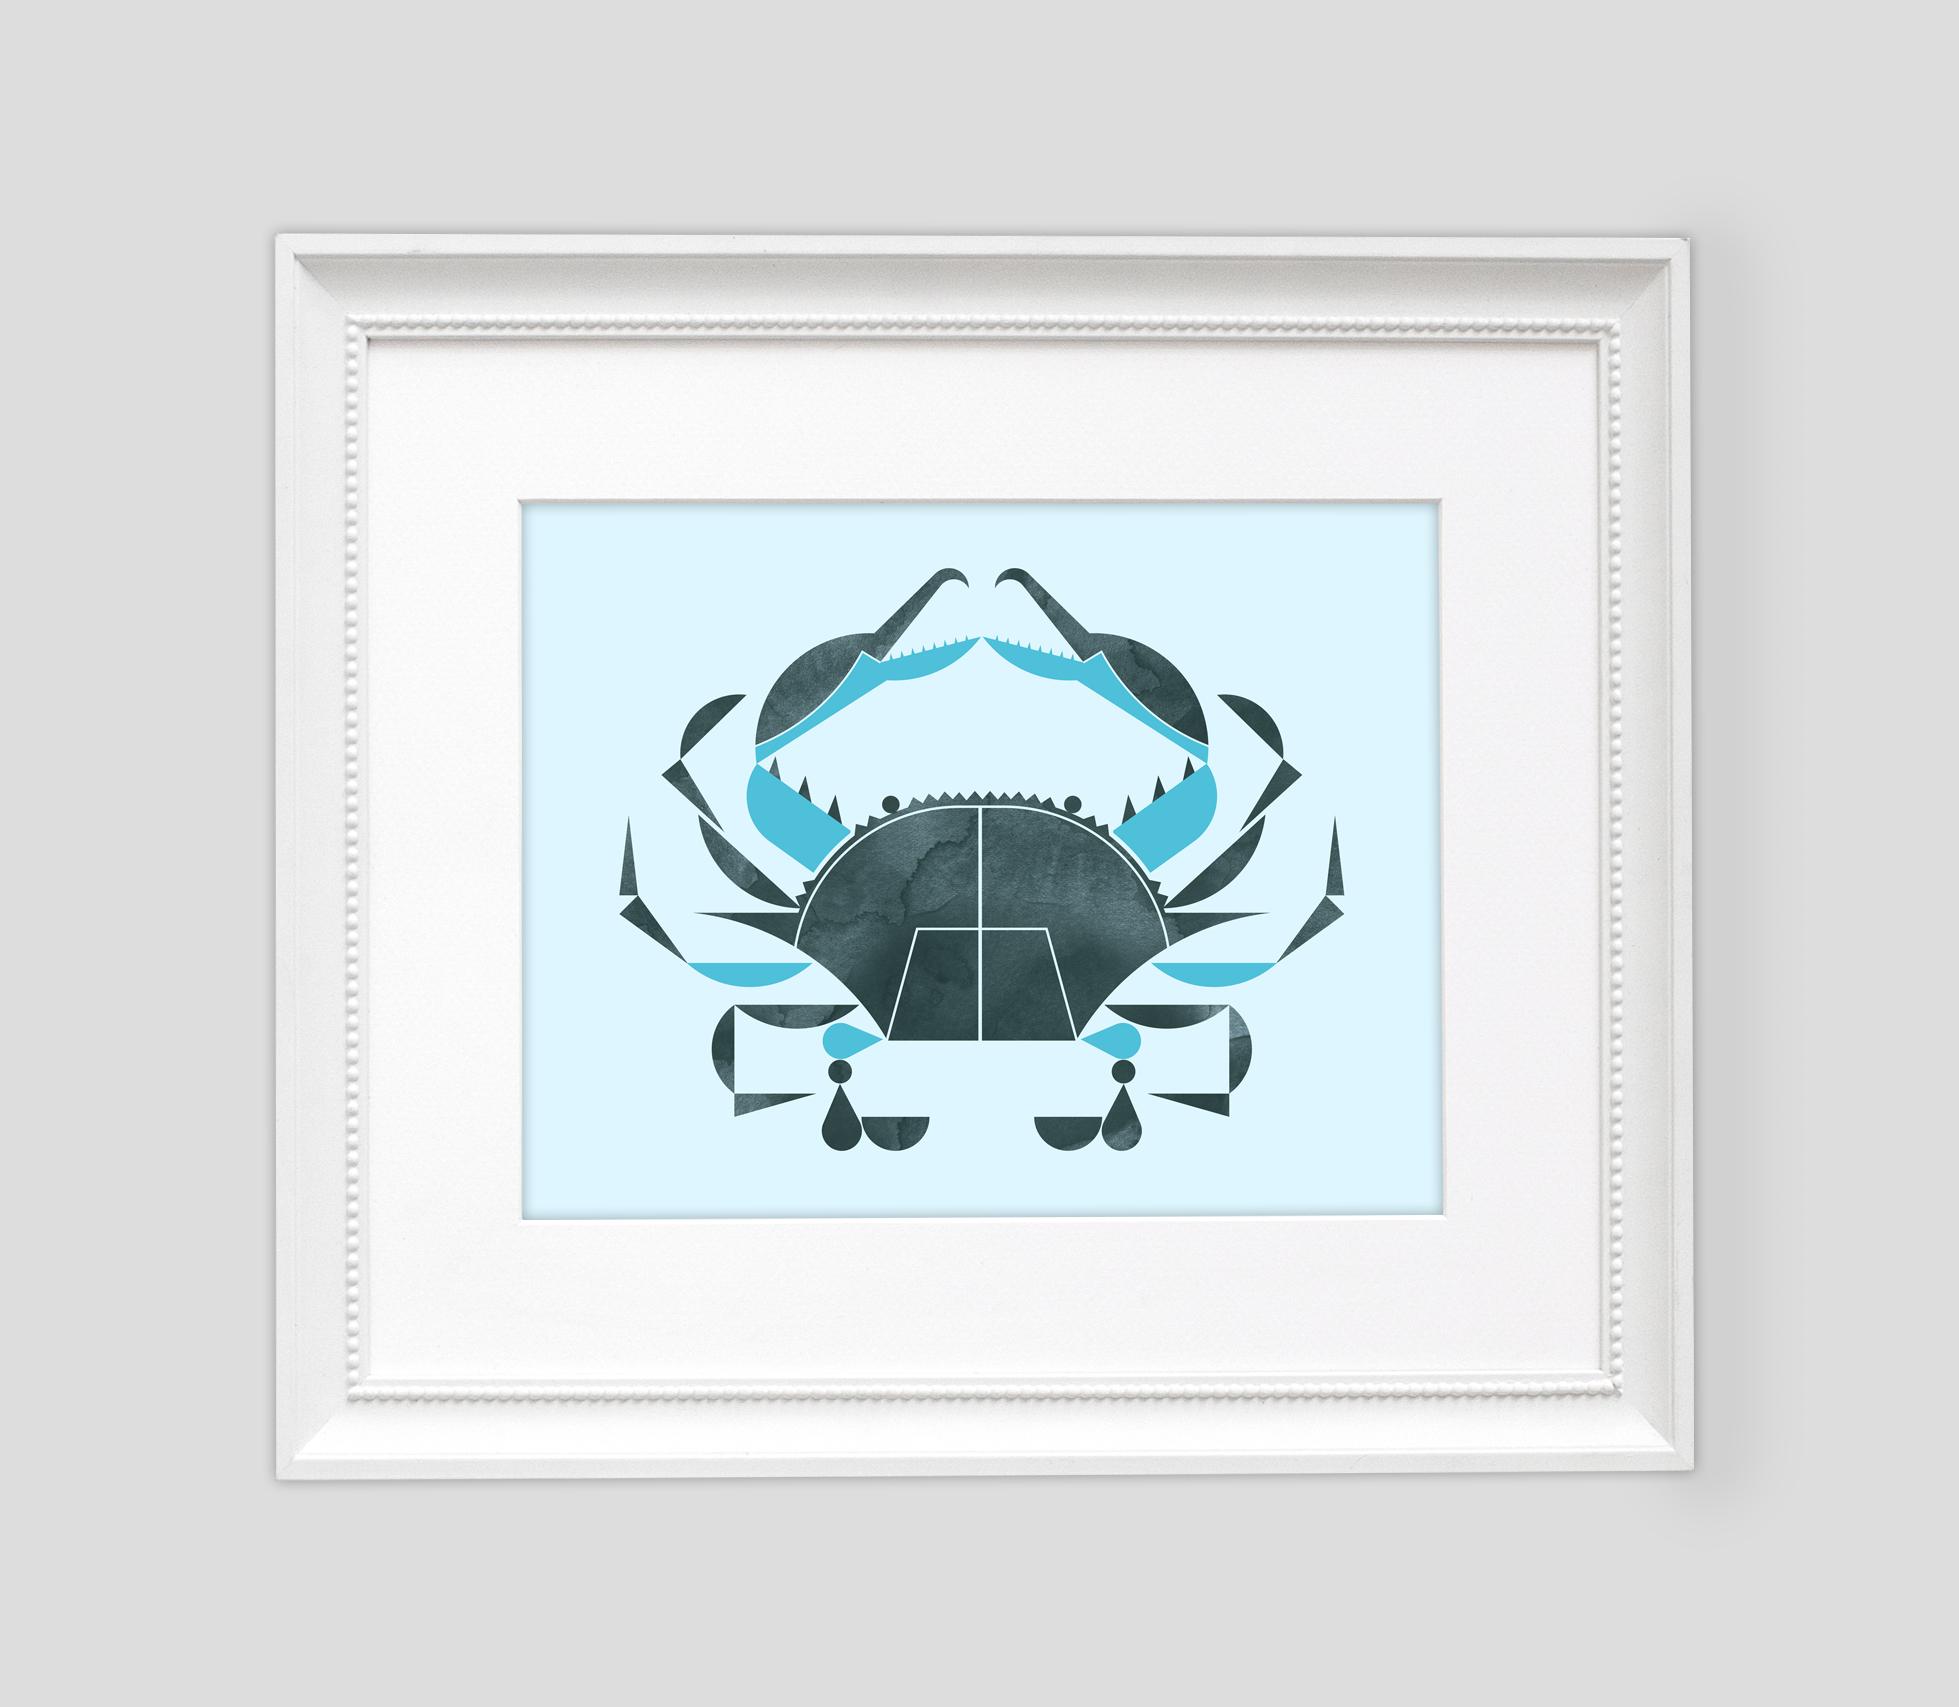 Blue Crab Framed2.jpg